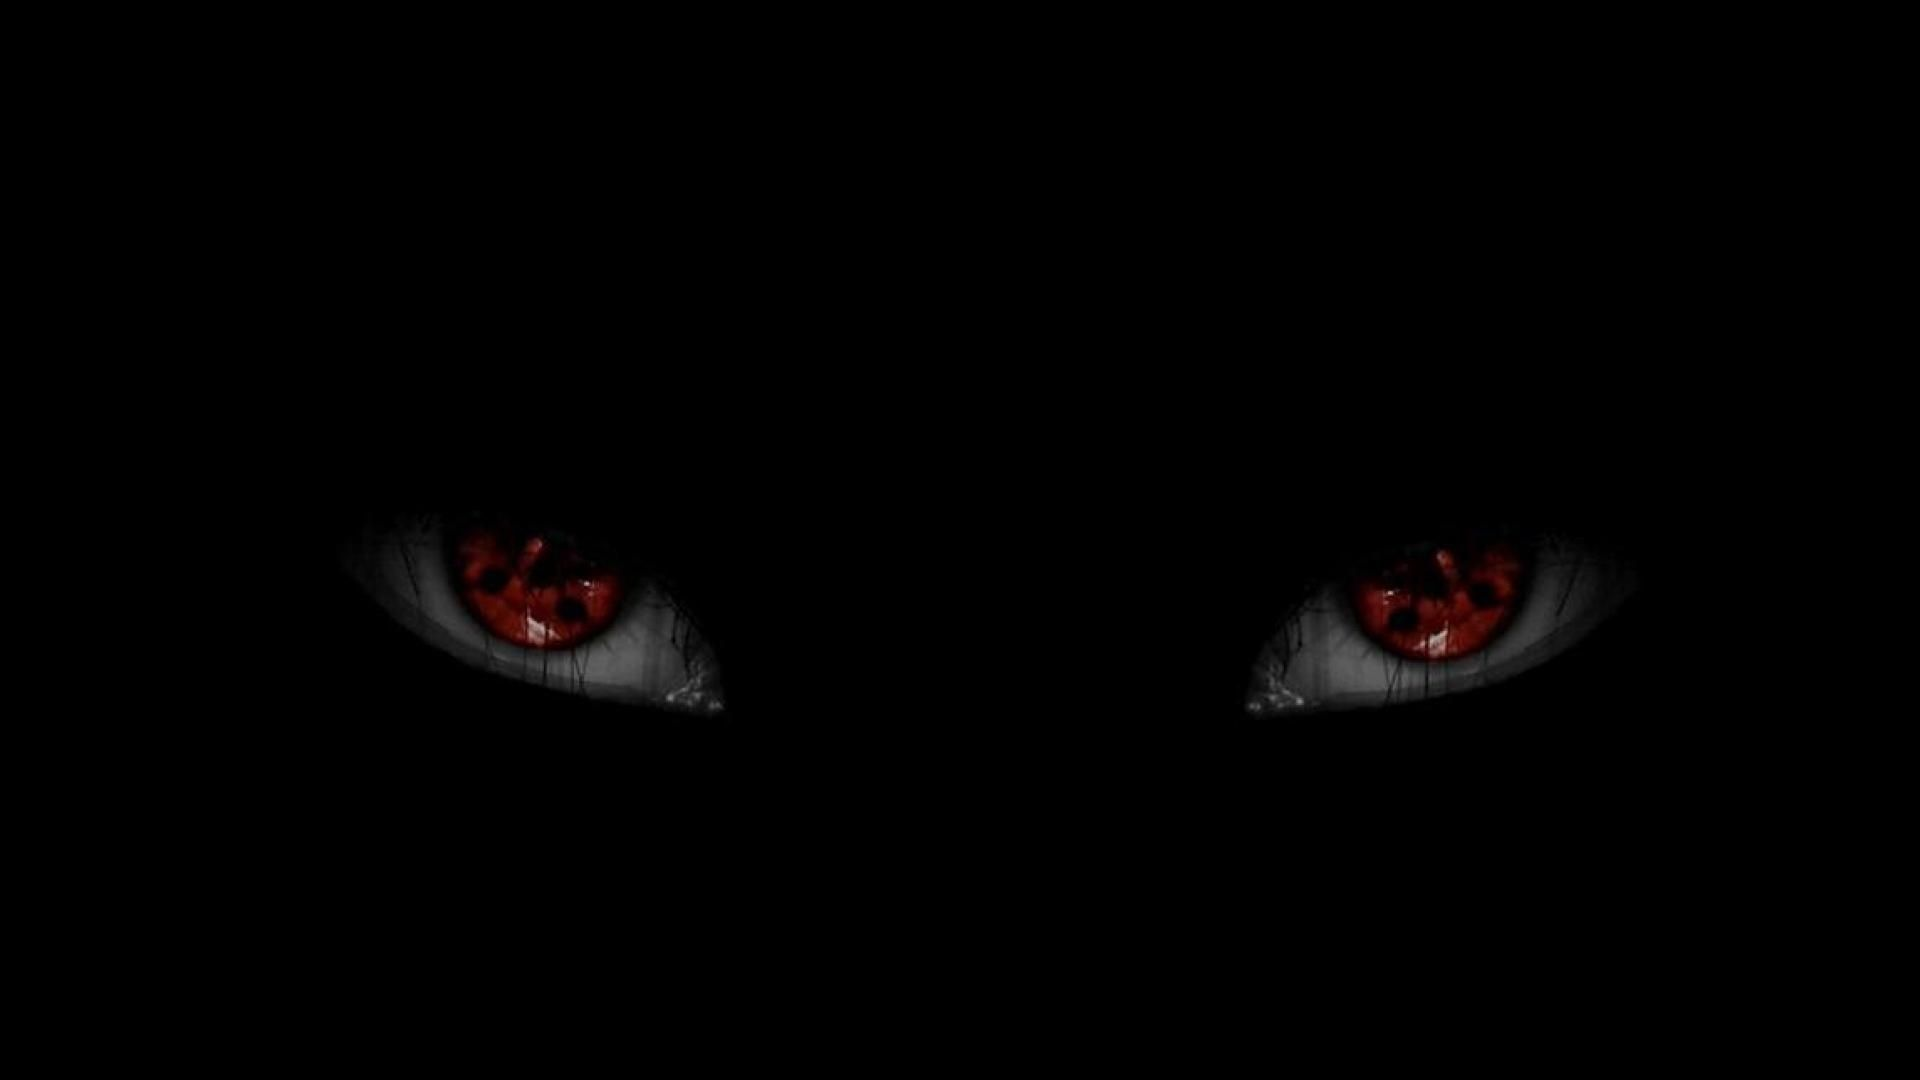 Lovely Eyes In The Dark Wallpaper Sharingan Wallpapers Anime Wallpaper Phone Itachi Uchiha